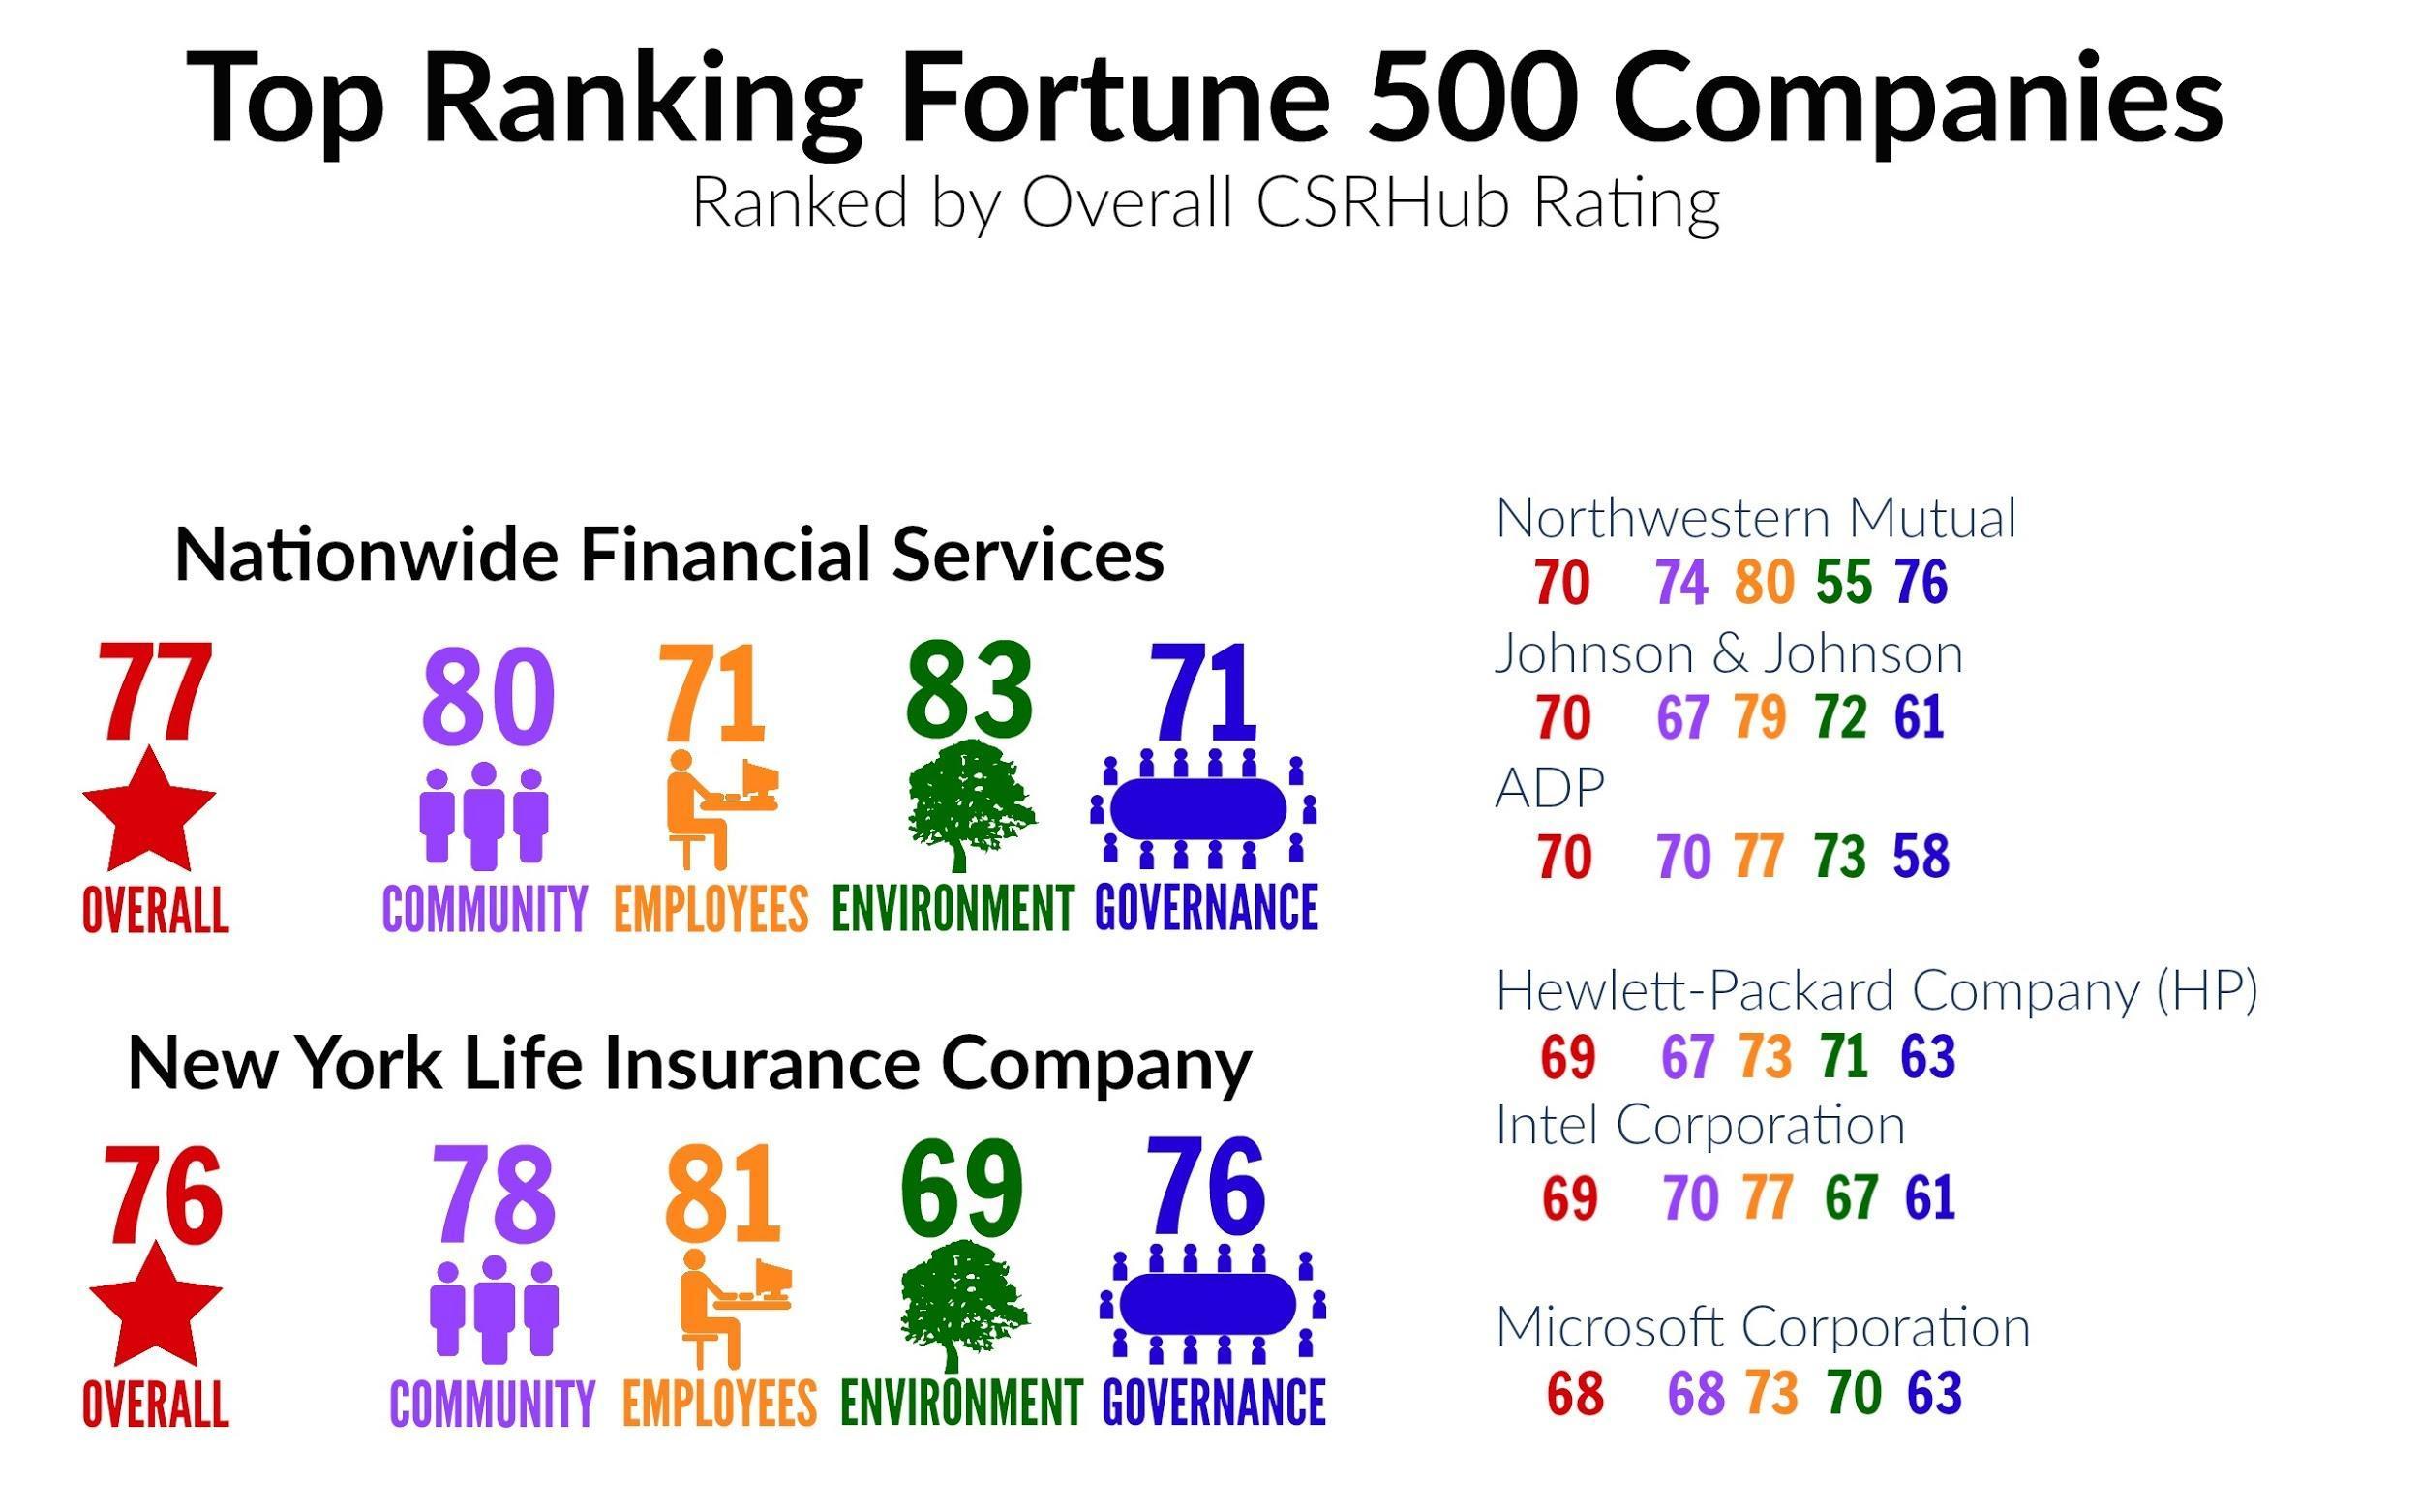 Top Ranking Fortune 500 Companies.jpg